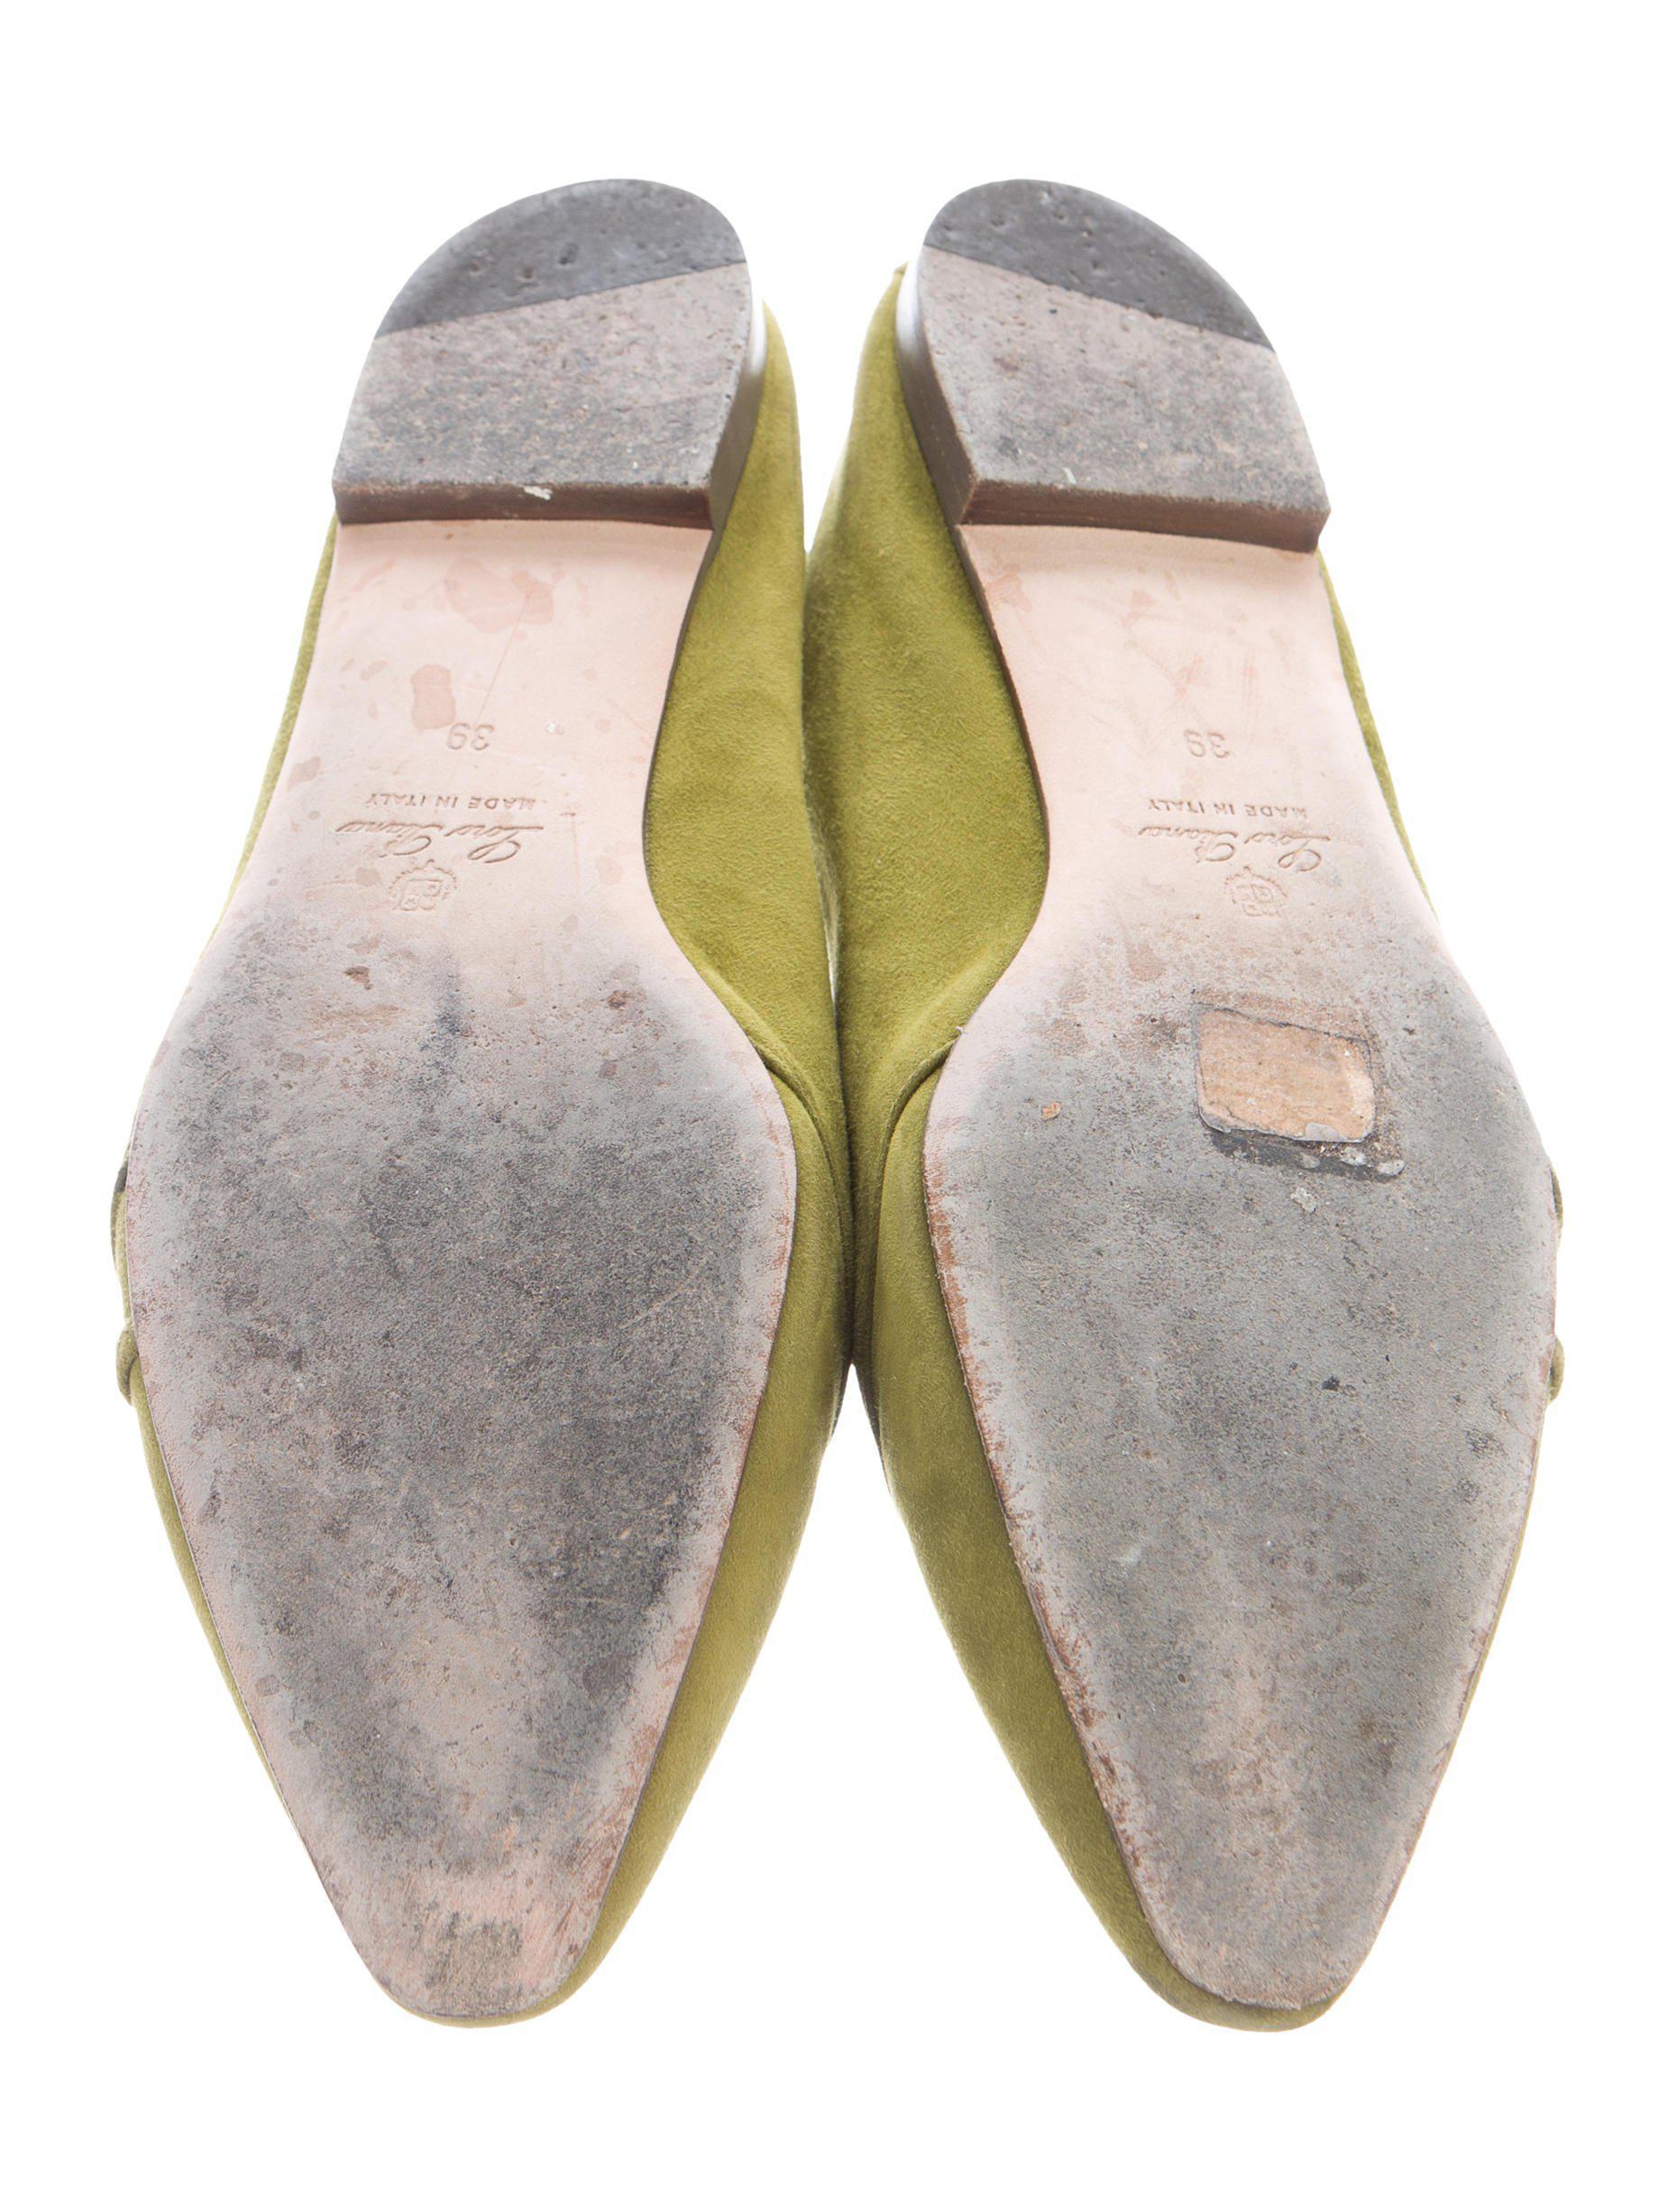 5955b476cc6 Lyst - Loro Piana Suede Pointed-toe Flats Green in Metallic